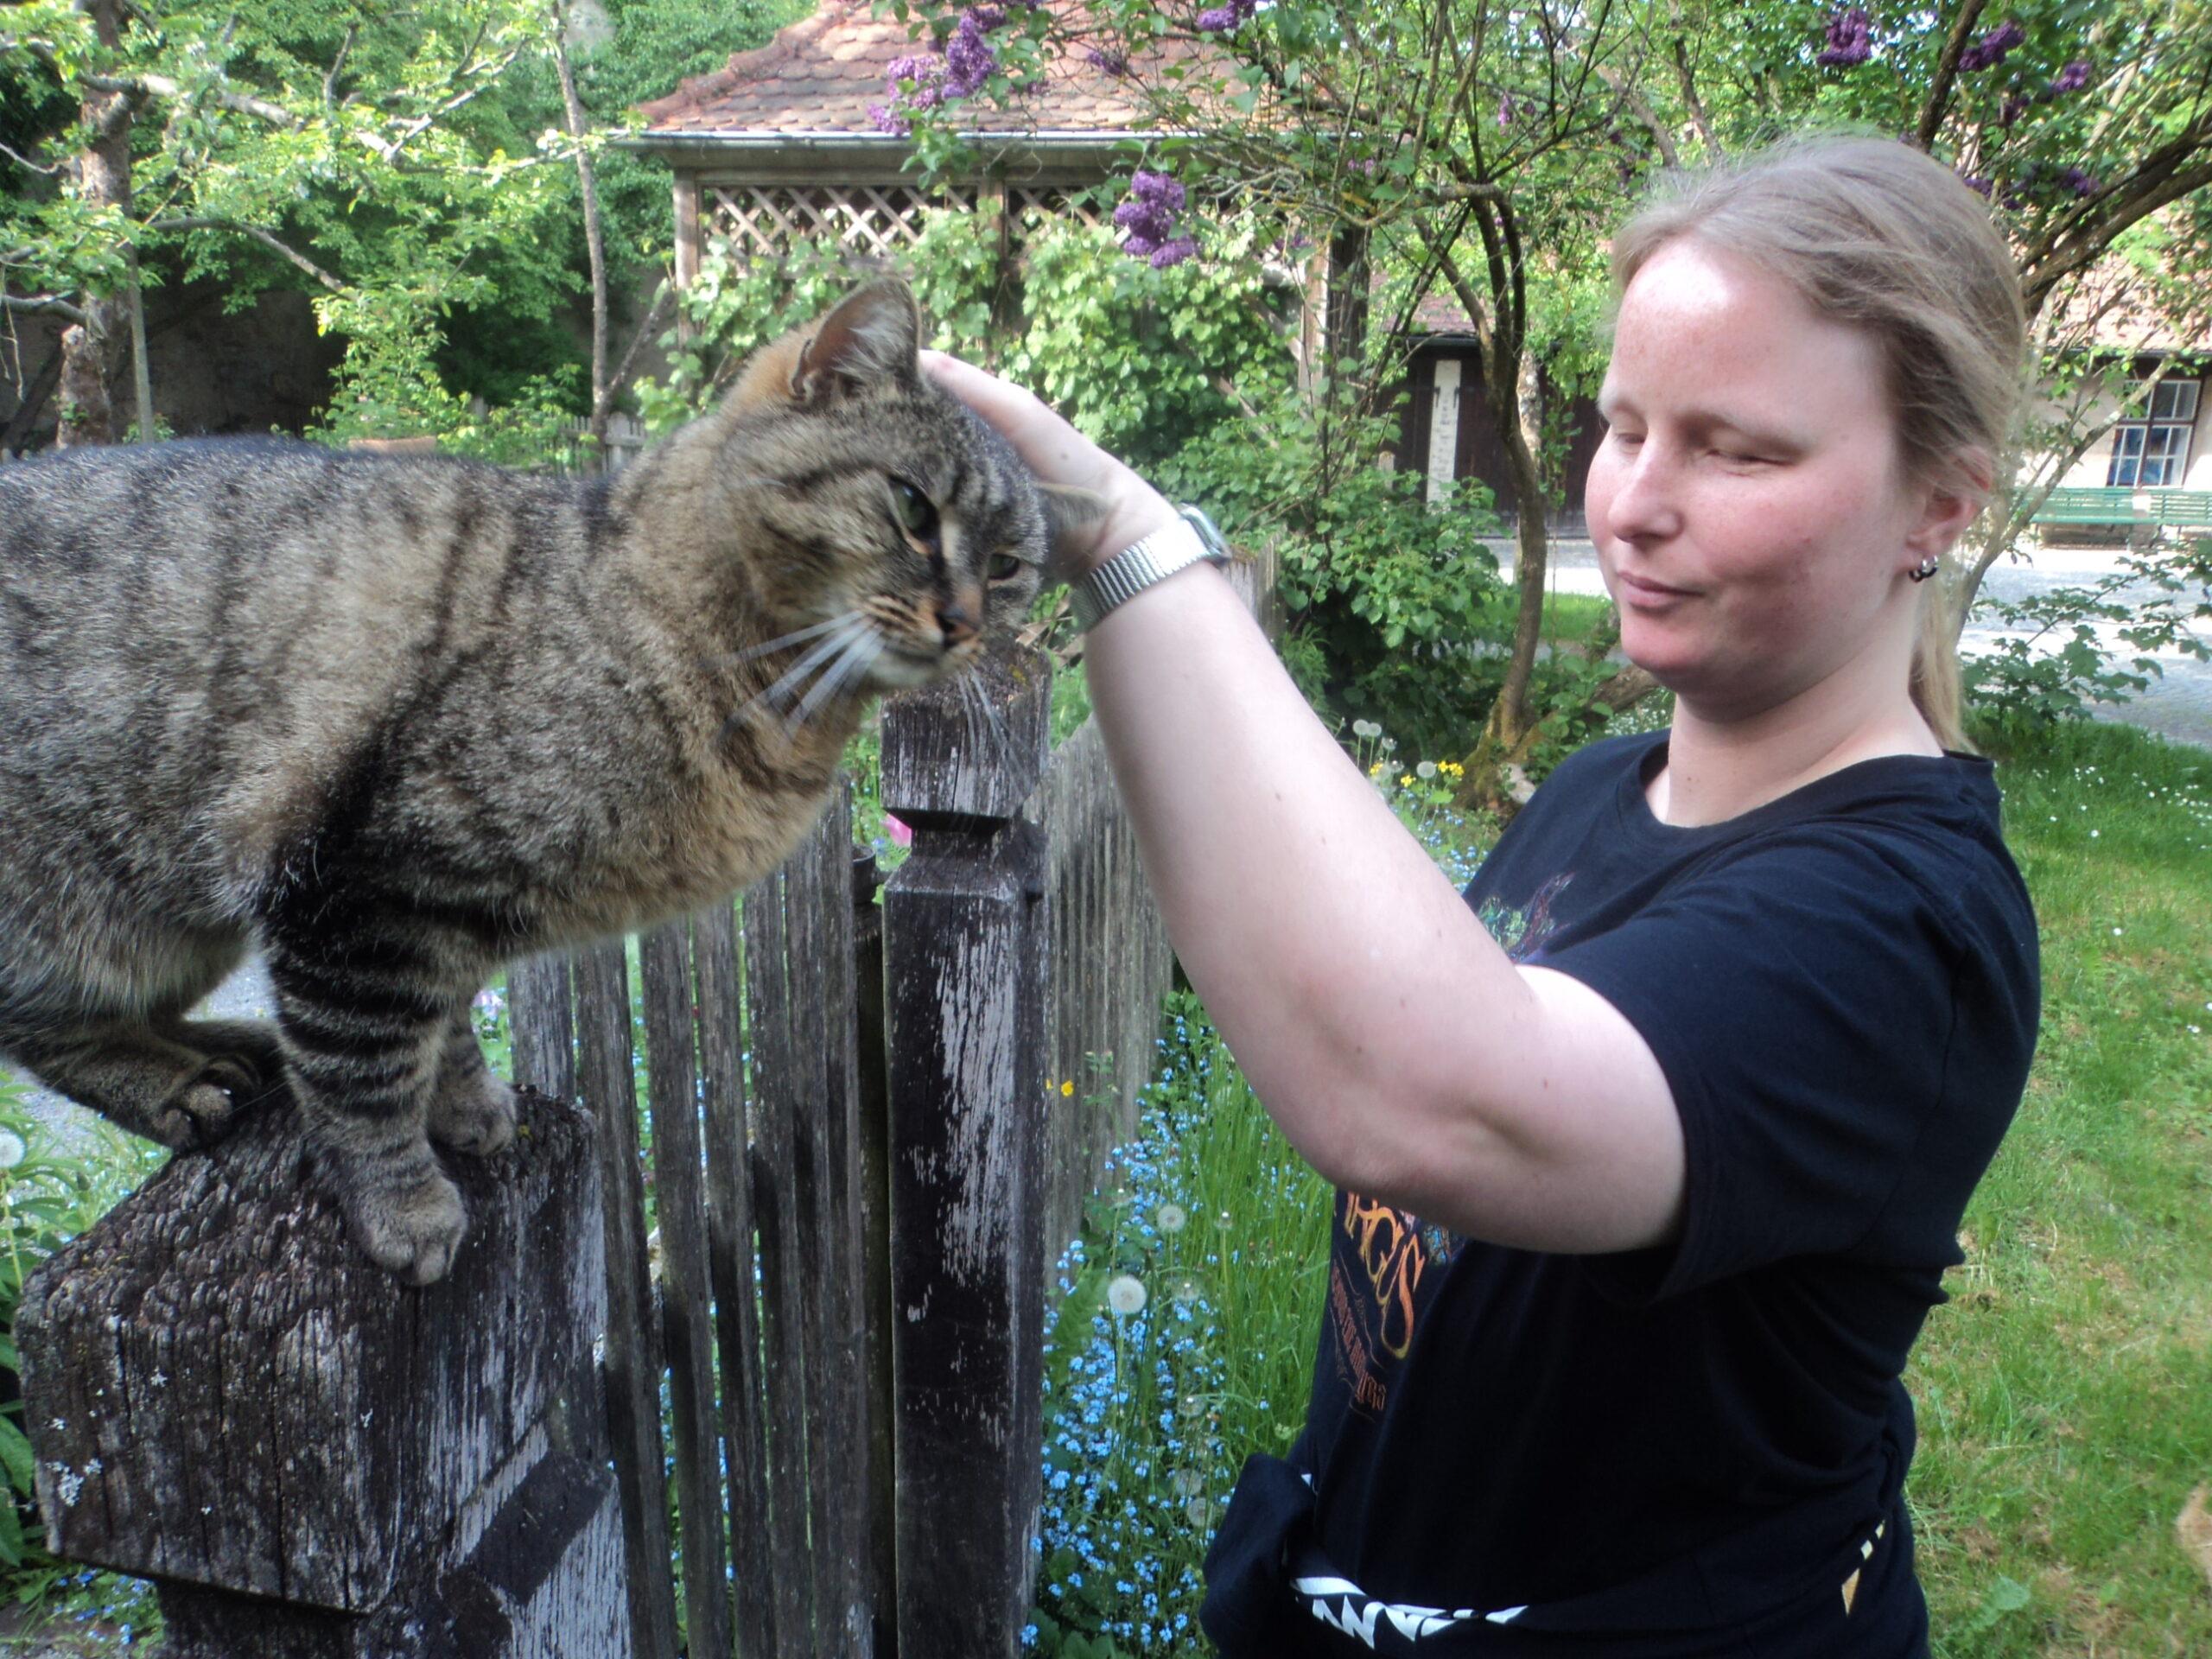 Svenja-Fabian-Sichtbar-Podcast-1